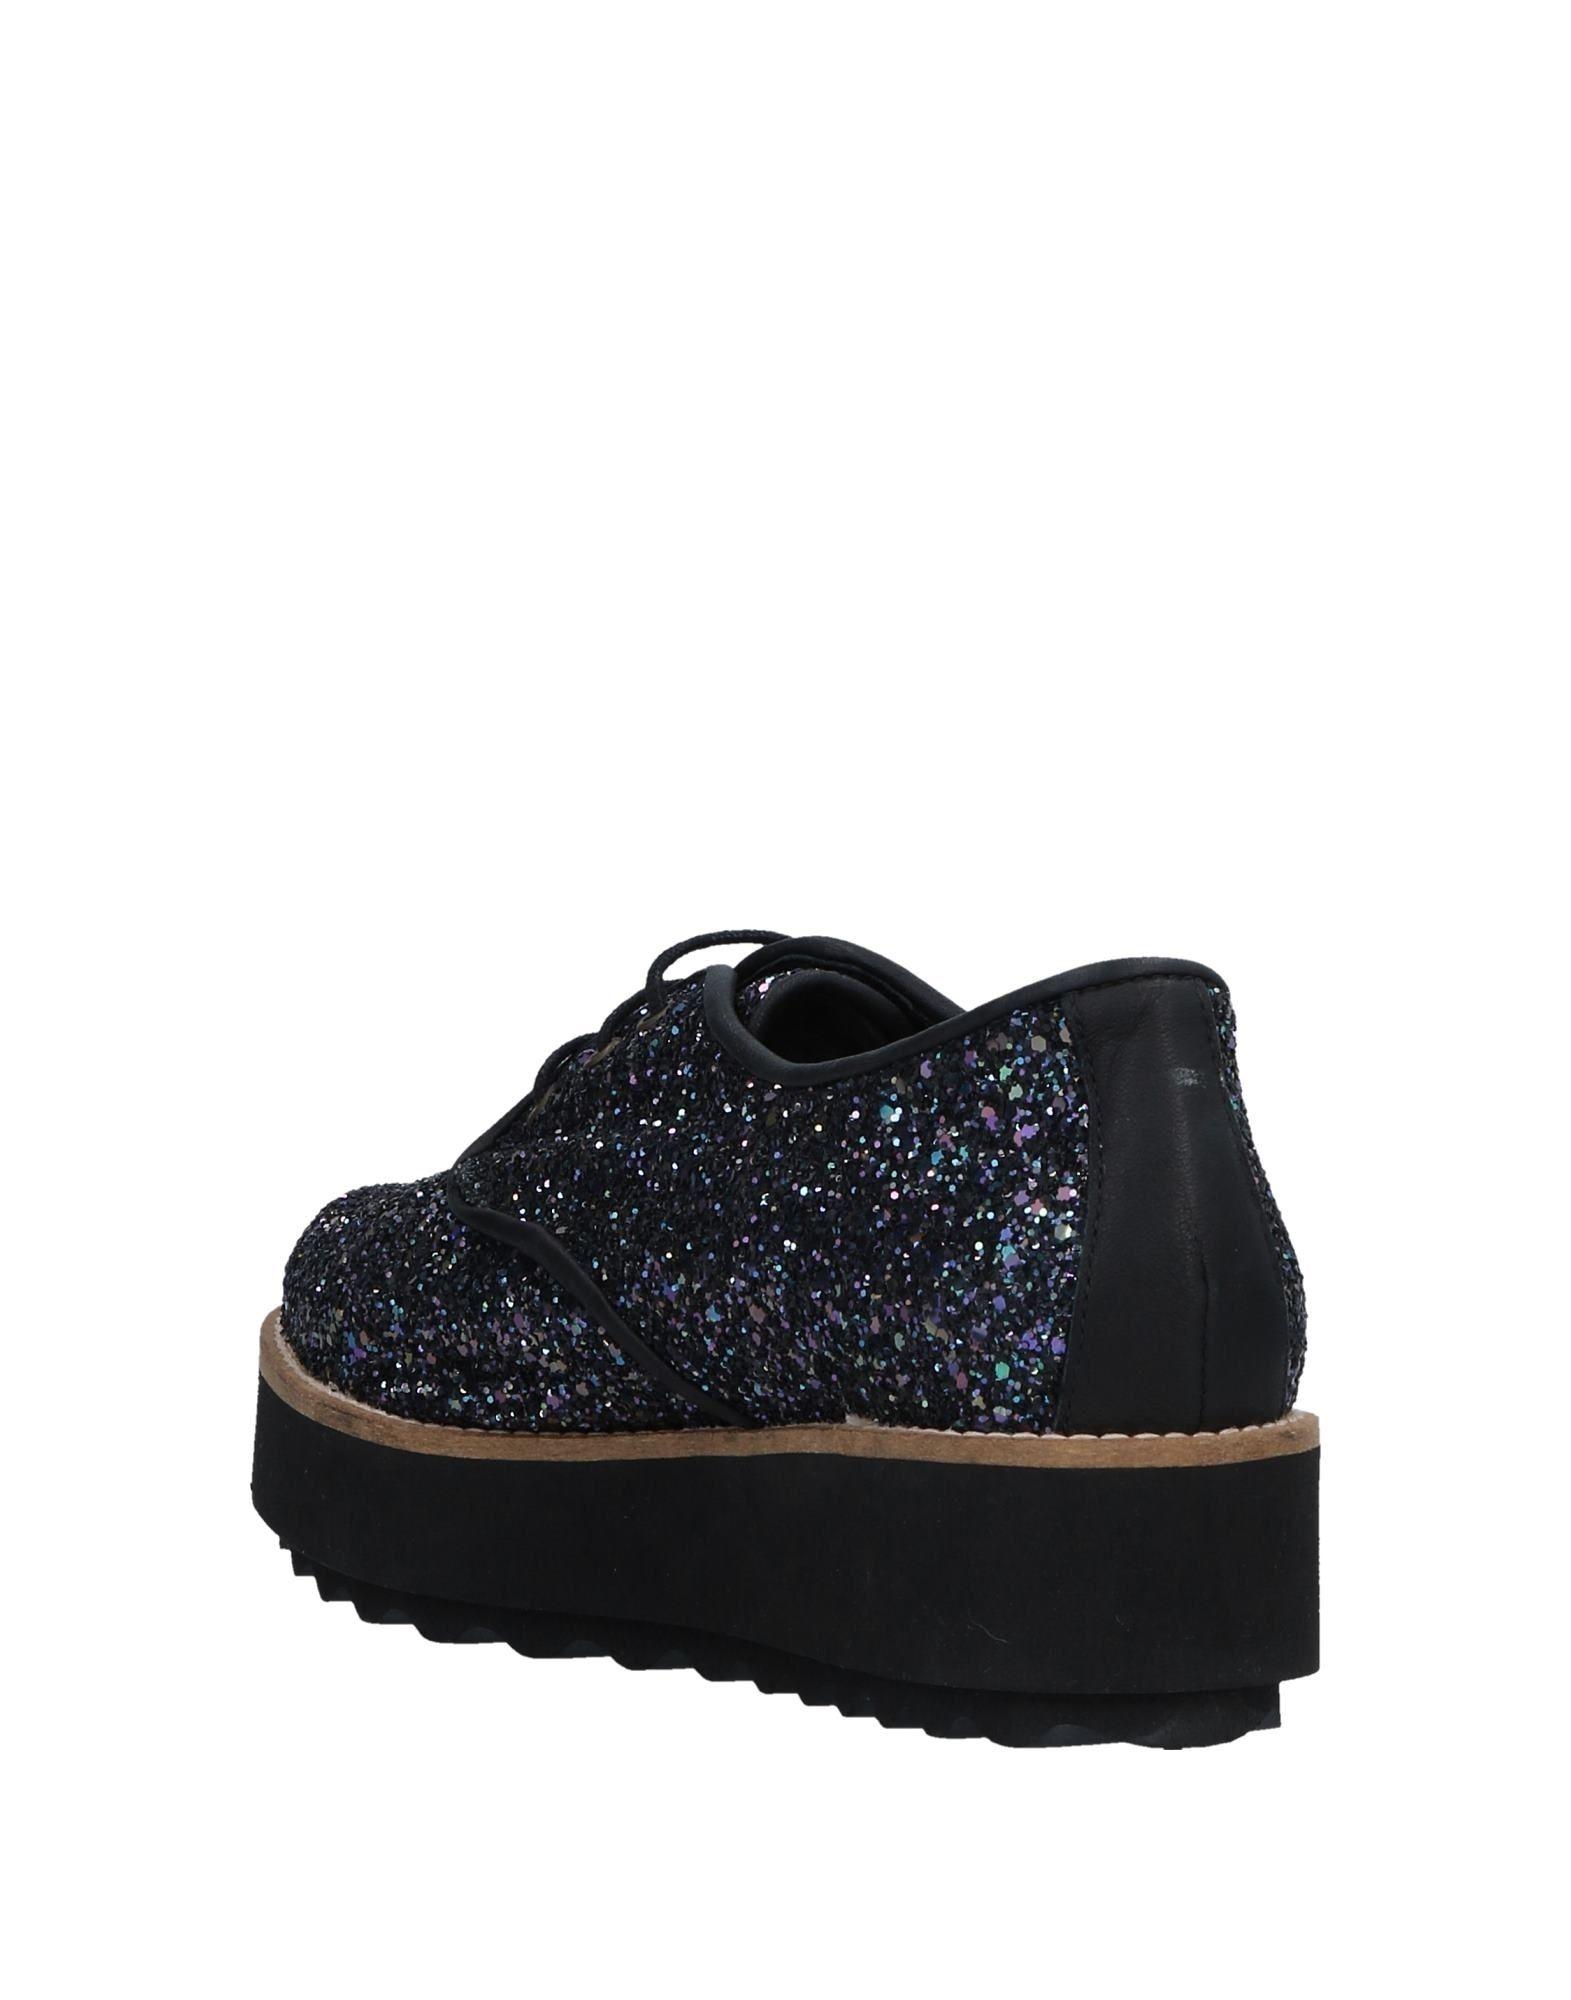 Espadrilles Schnürschuhe Qualität Damen  11533719PB Gute Qualität Schnürschuhe beliebte Schuhe cabd5a